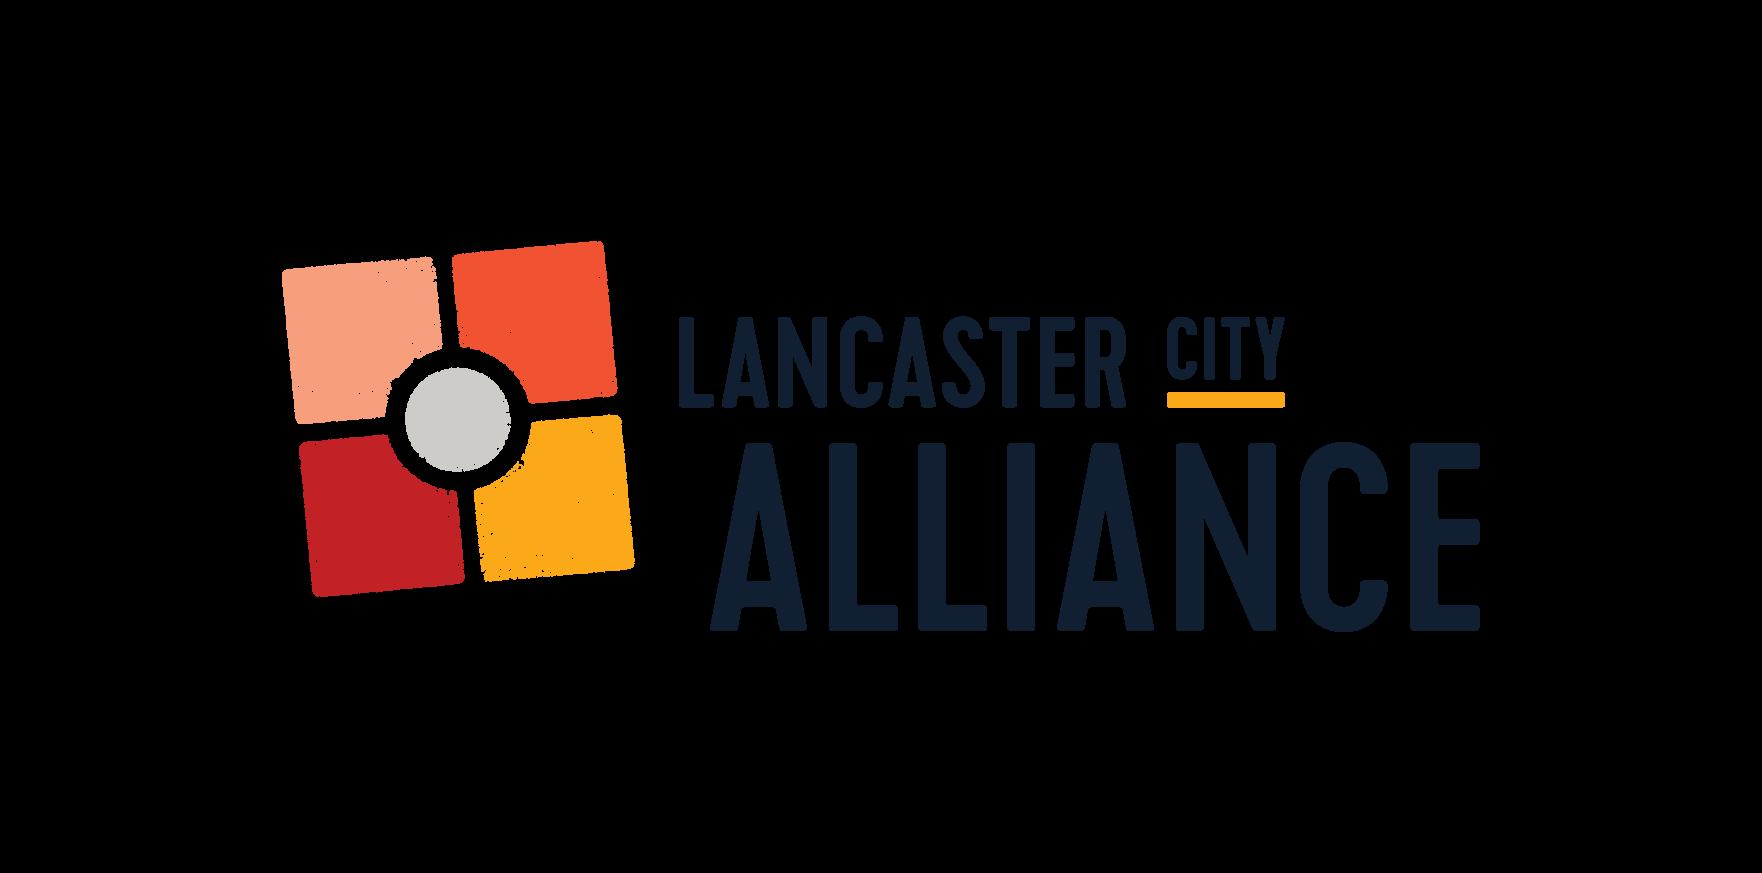 Lancaster City Alliance